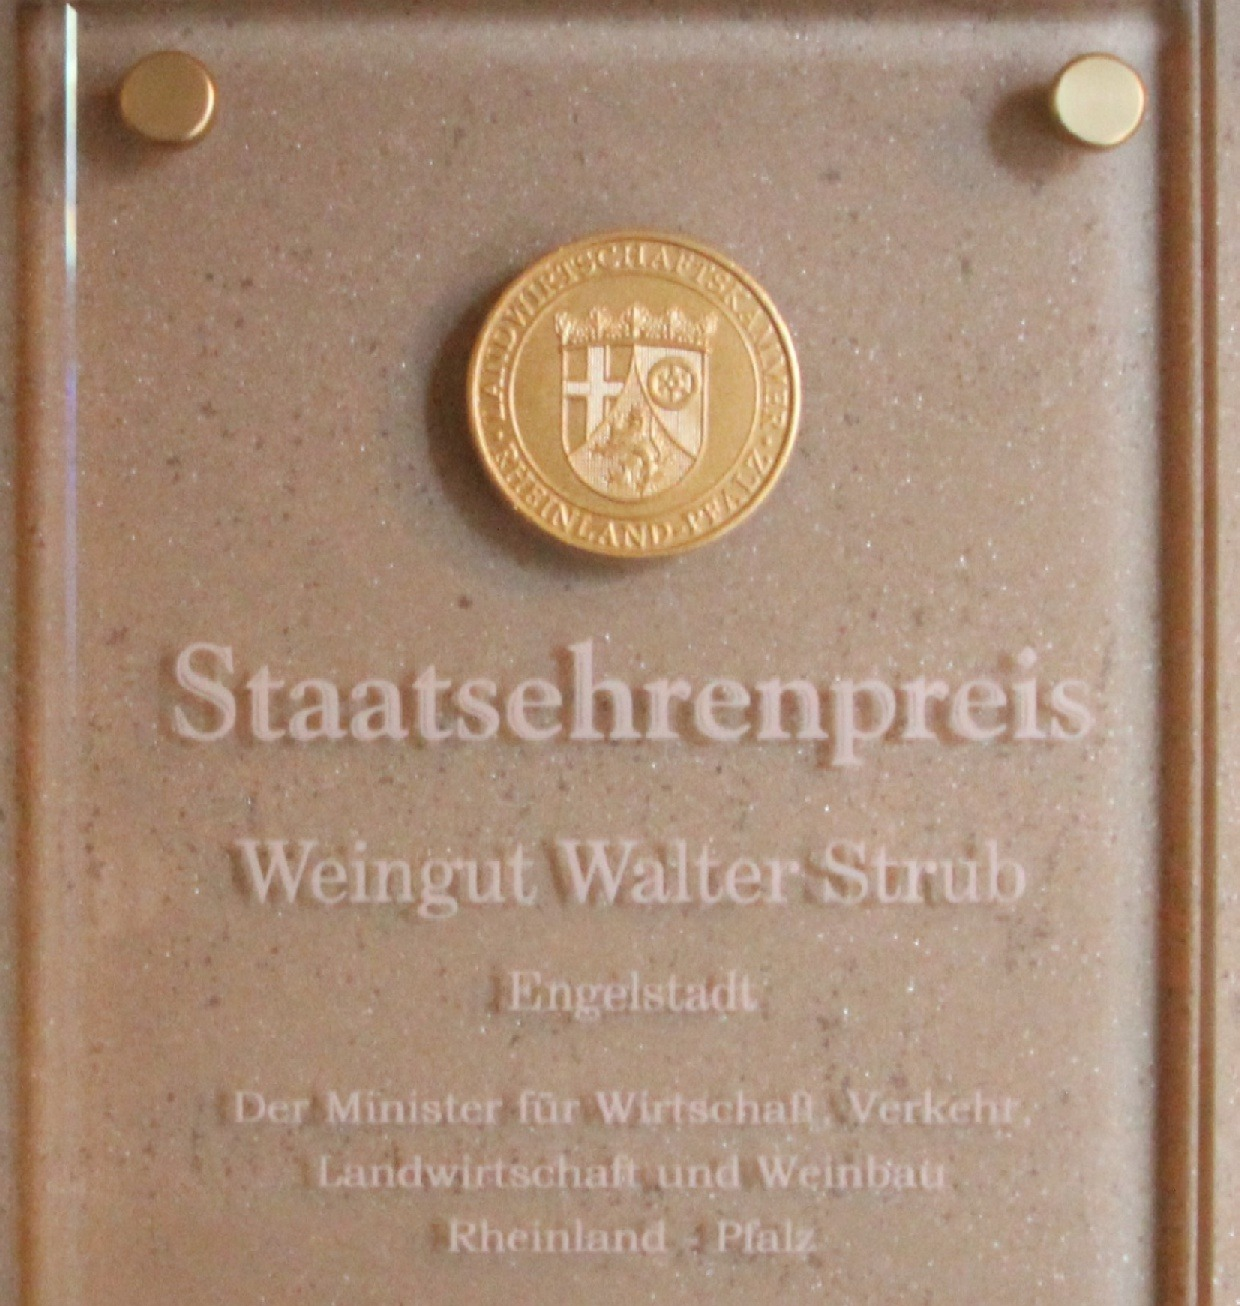 Staatsehrenpreis_edited